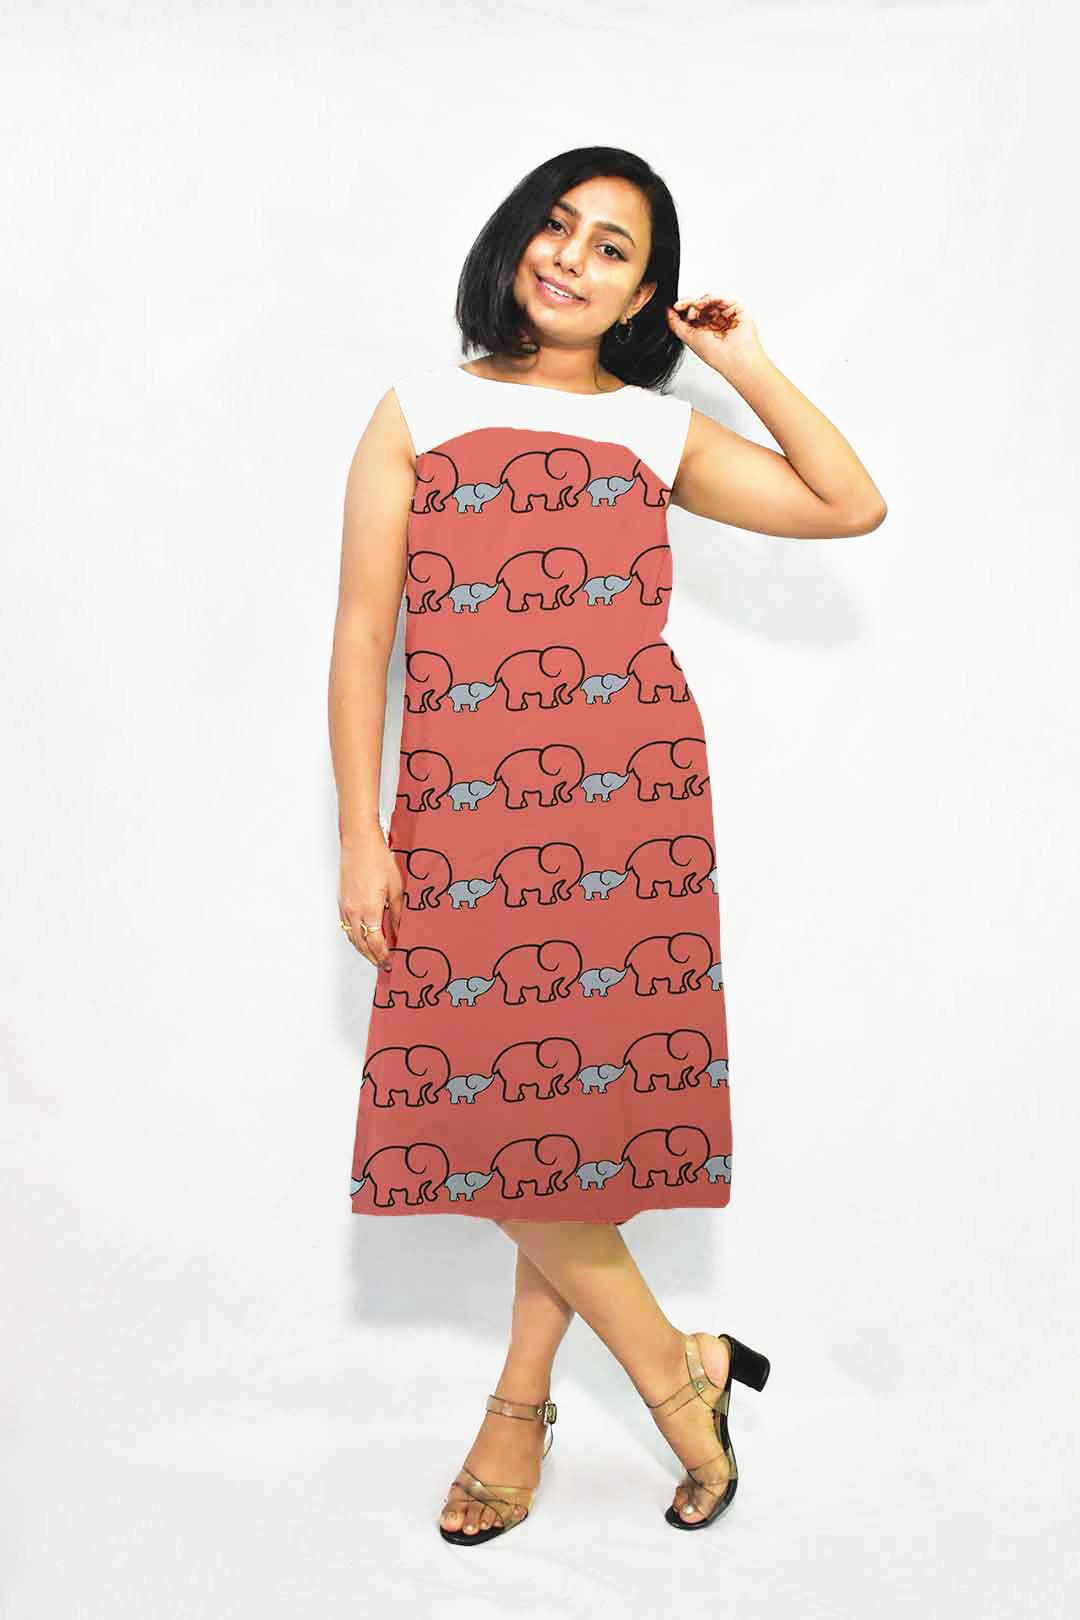 Cotton A line dress – Bade Miya, Chote Miya